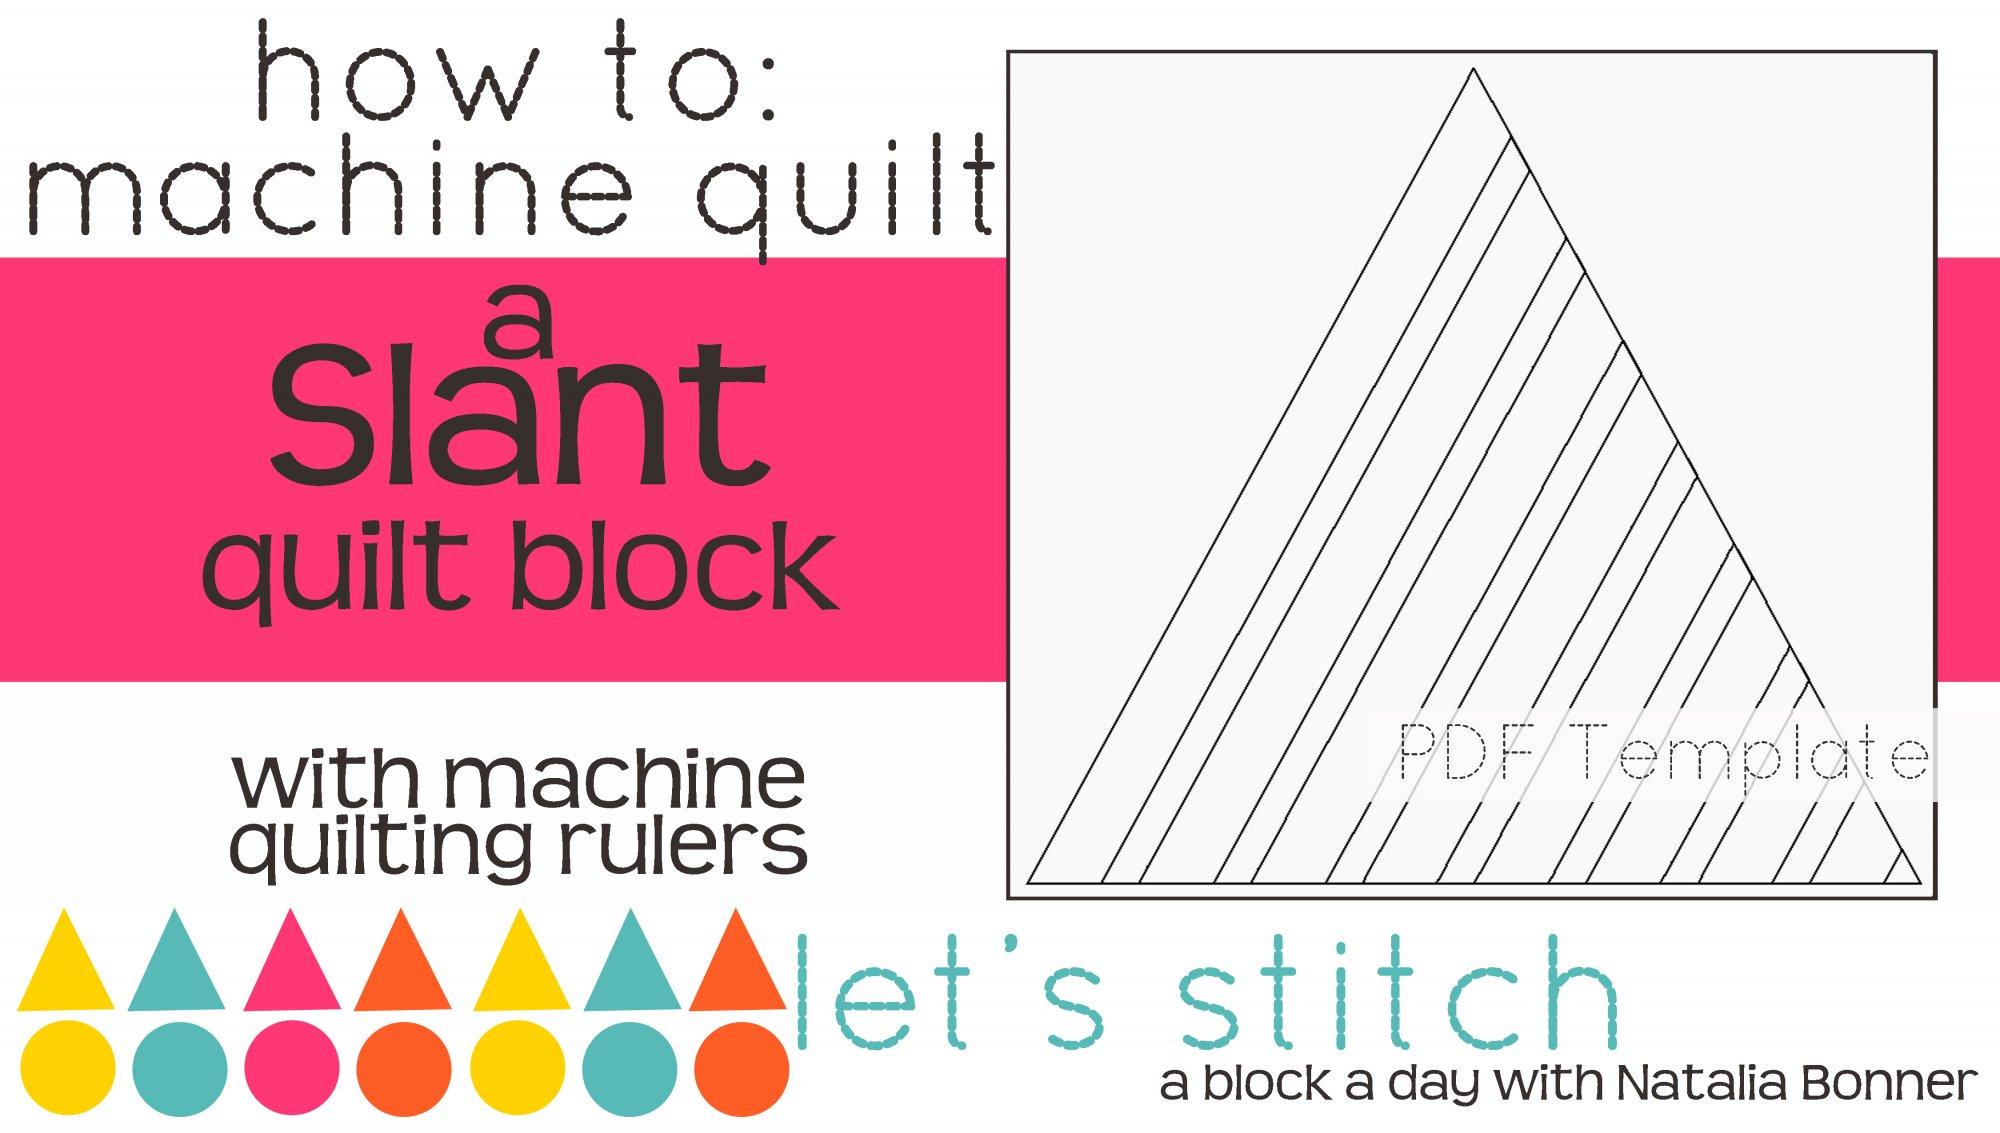 Let's Stitch - A Block a Day With Natalia Bonner - PDF - Slant